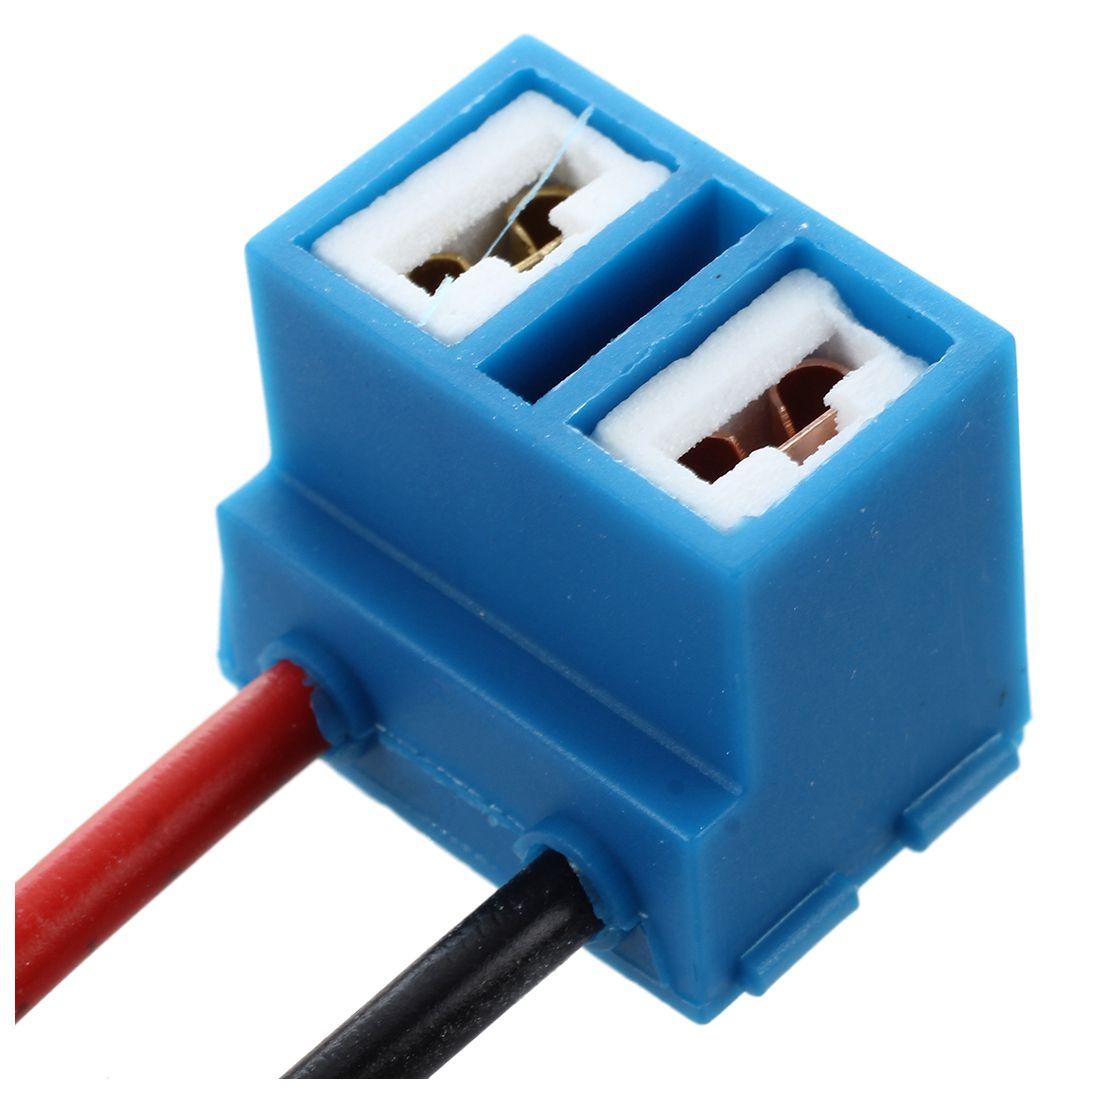 2 x H7 Ceramic Headlight Light Bulb Wire Plug Socket for Car T2M9 ...